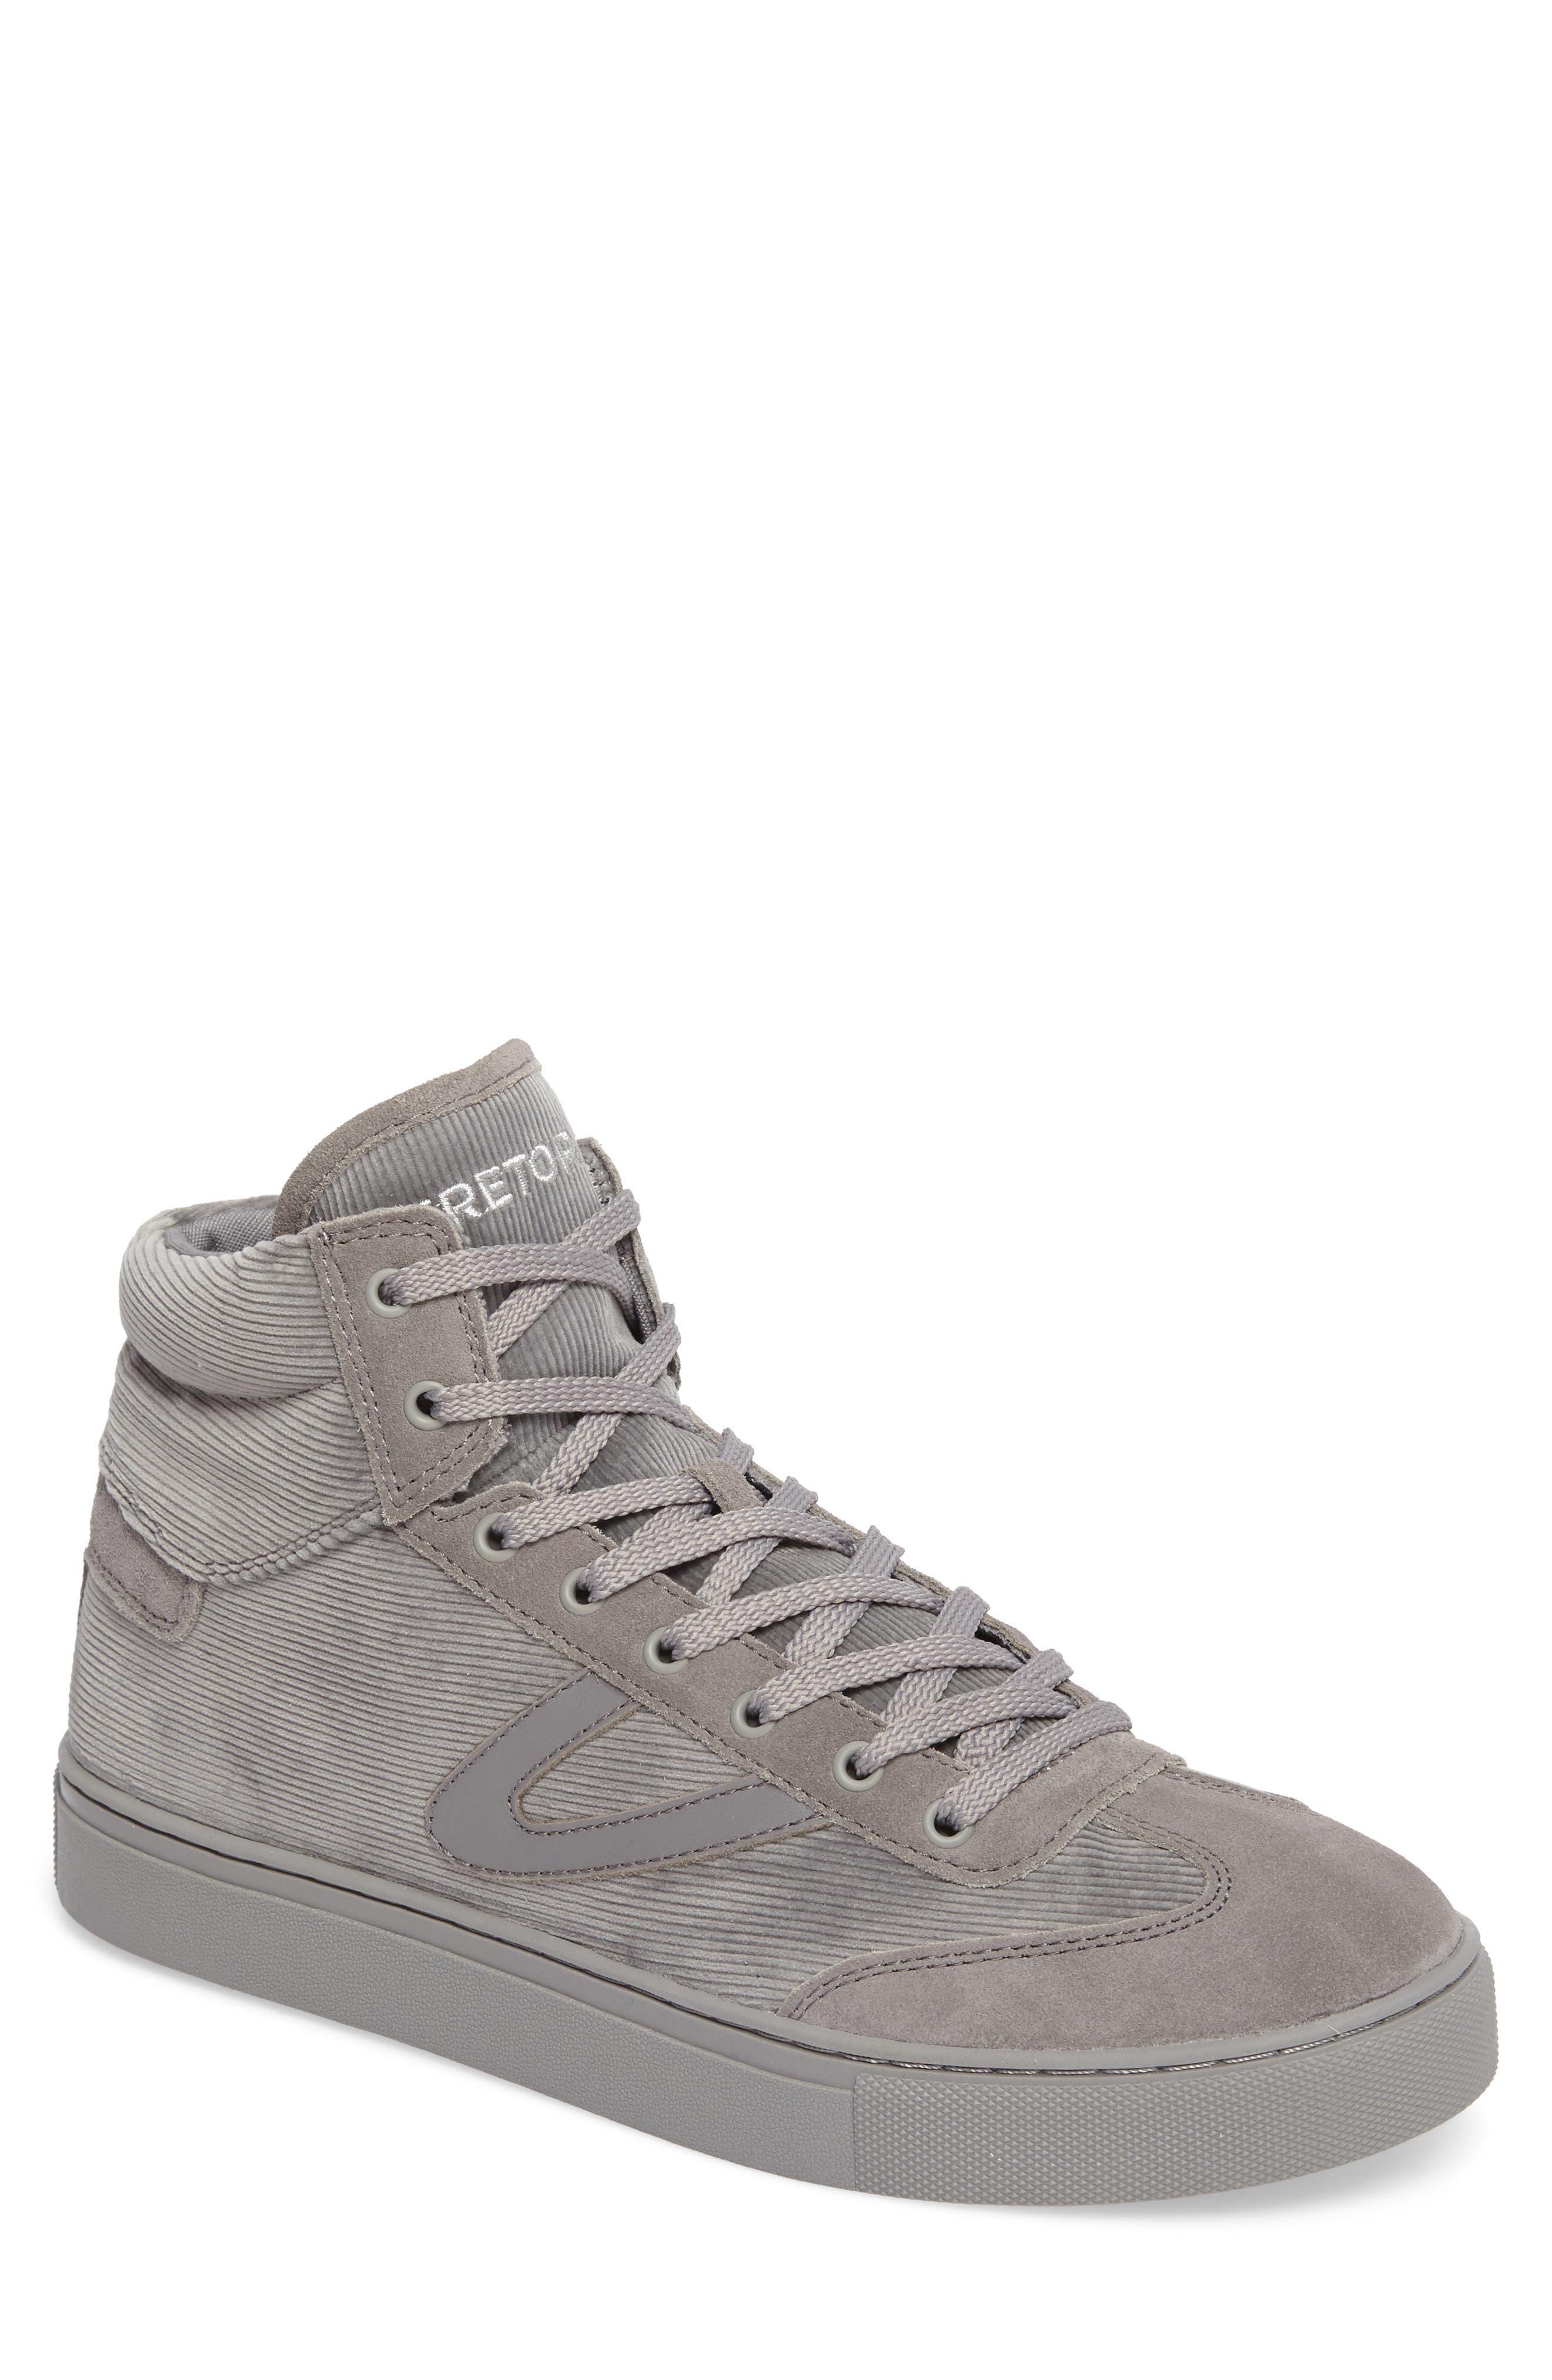 Jack High Top Sneaker,                             Main thumbnail 1, color,                             Grey/ Grey